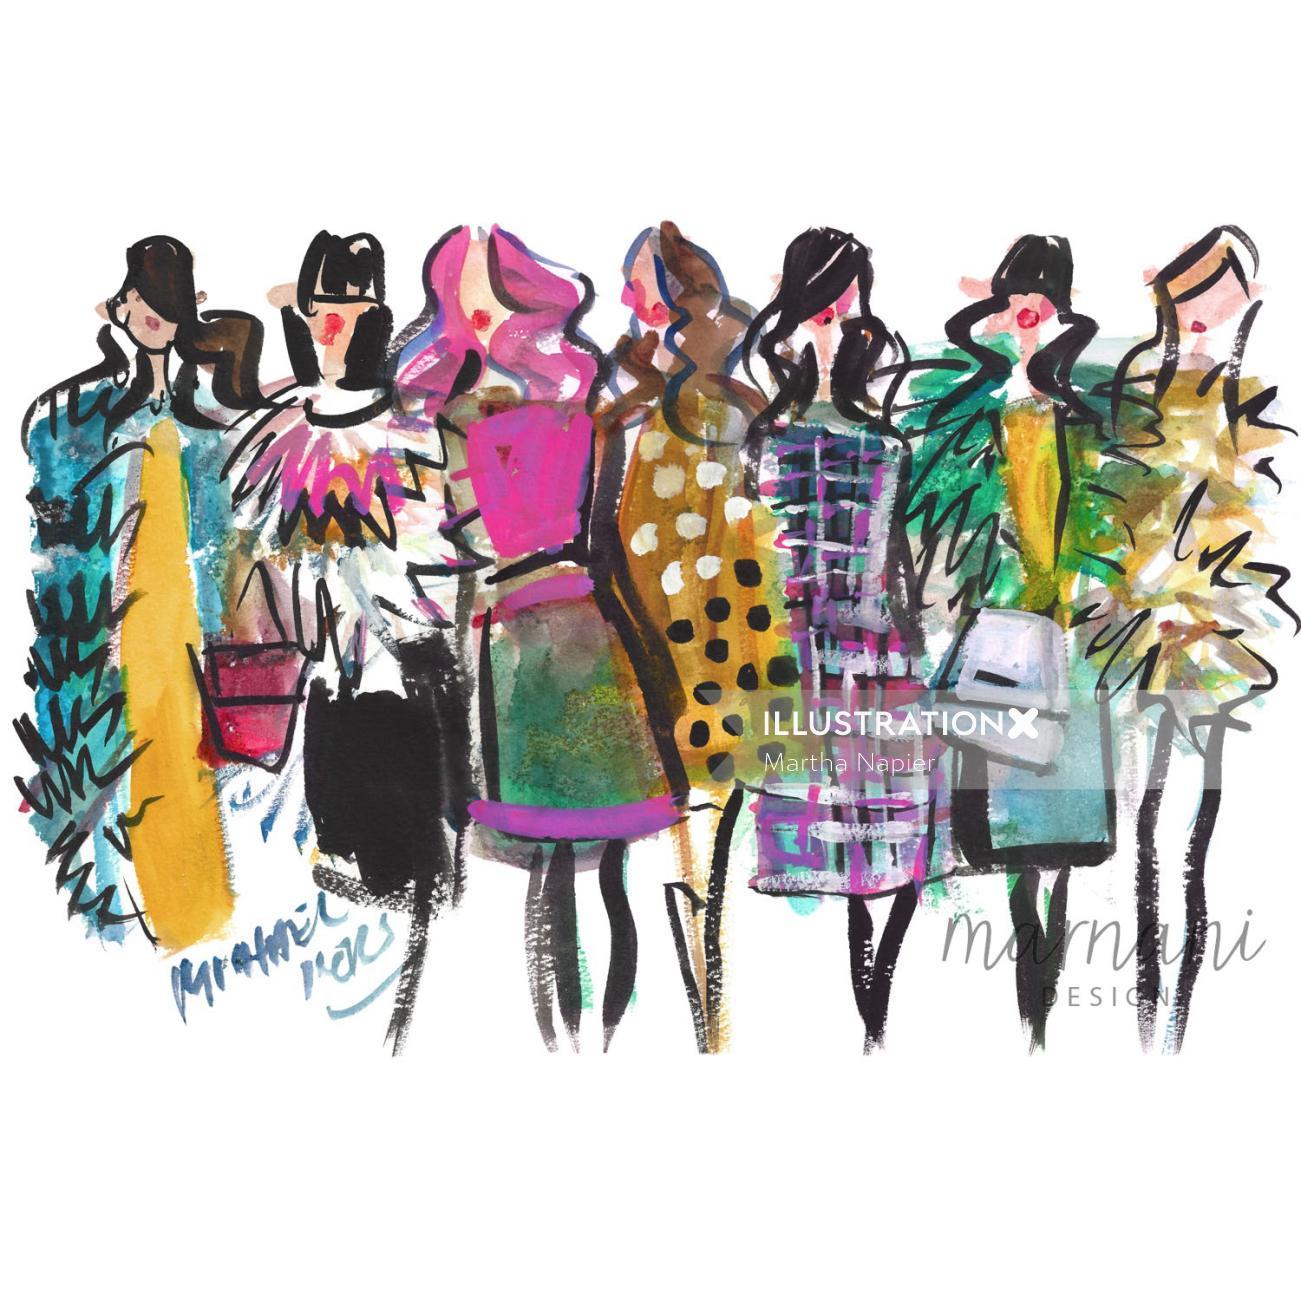 Women fashion week illustration by Martha Napier